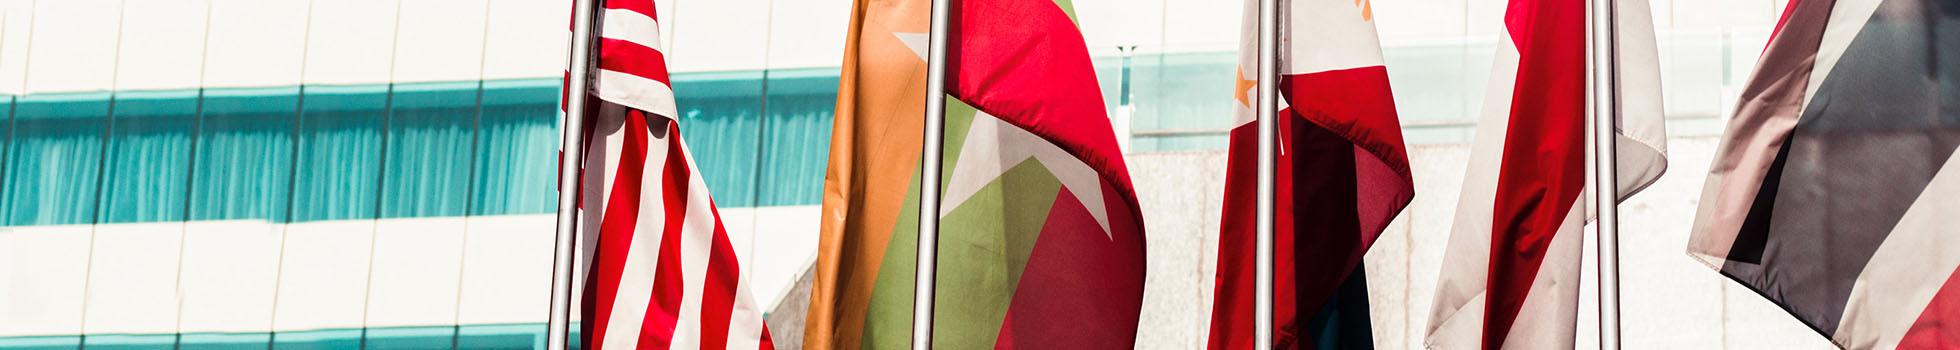 International flags on a pole.